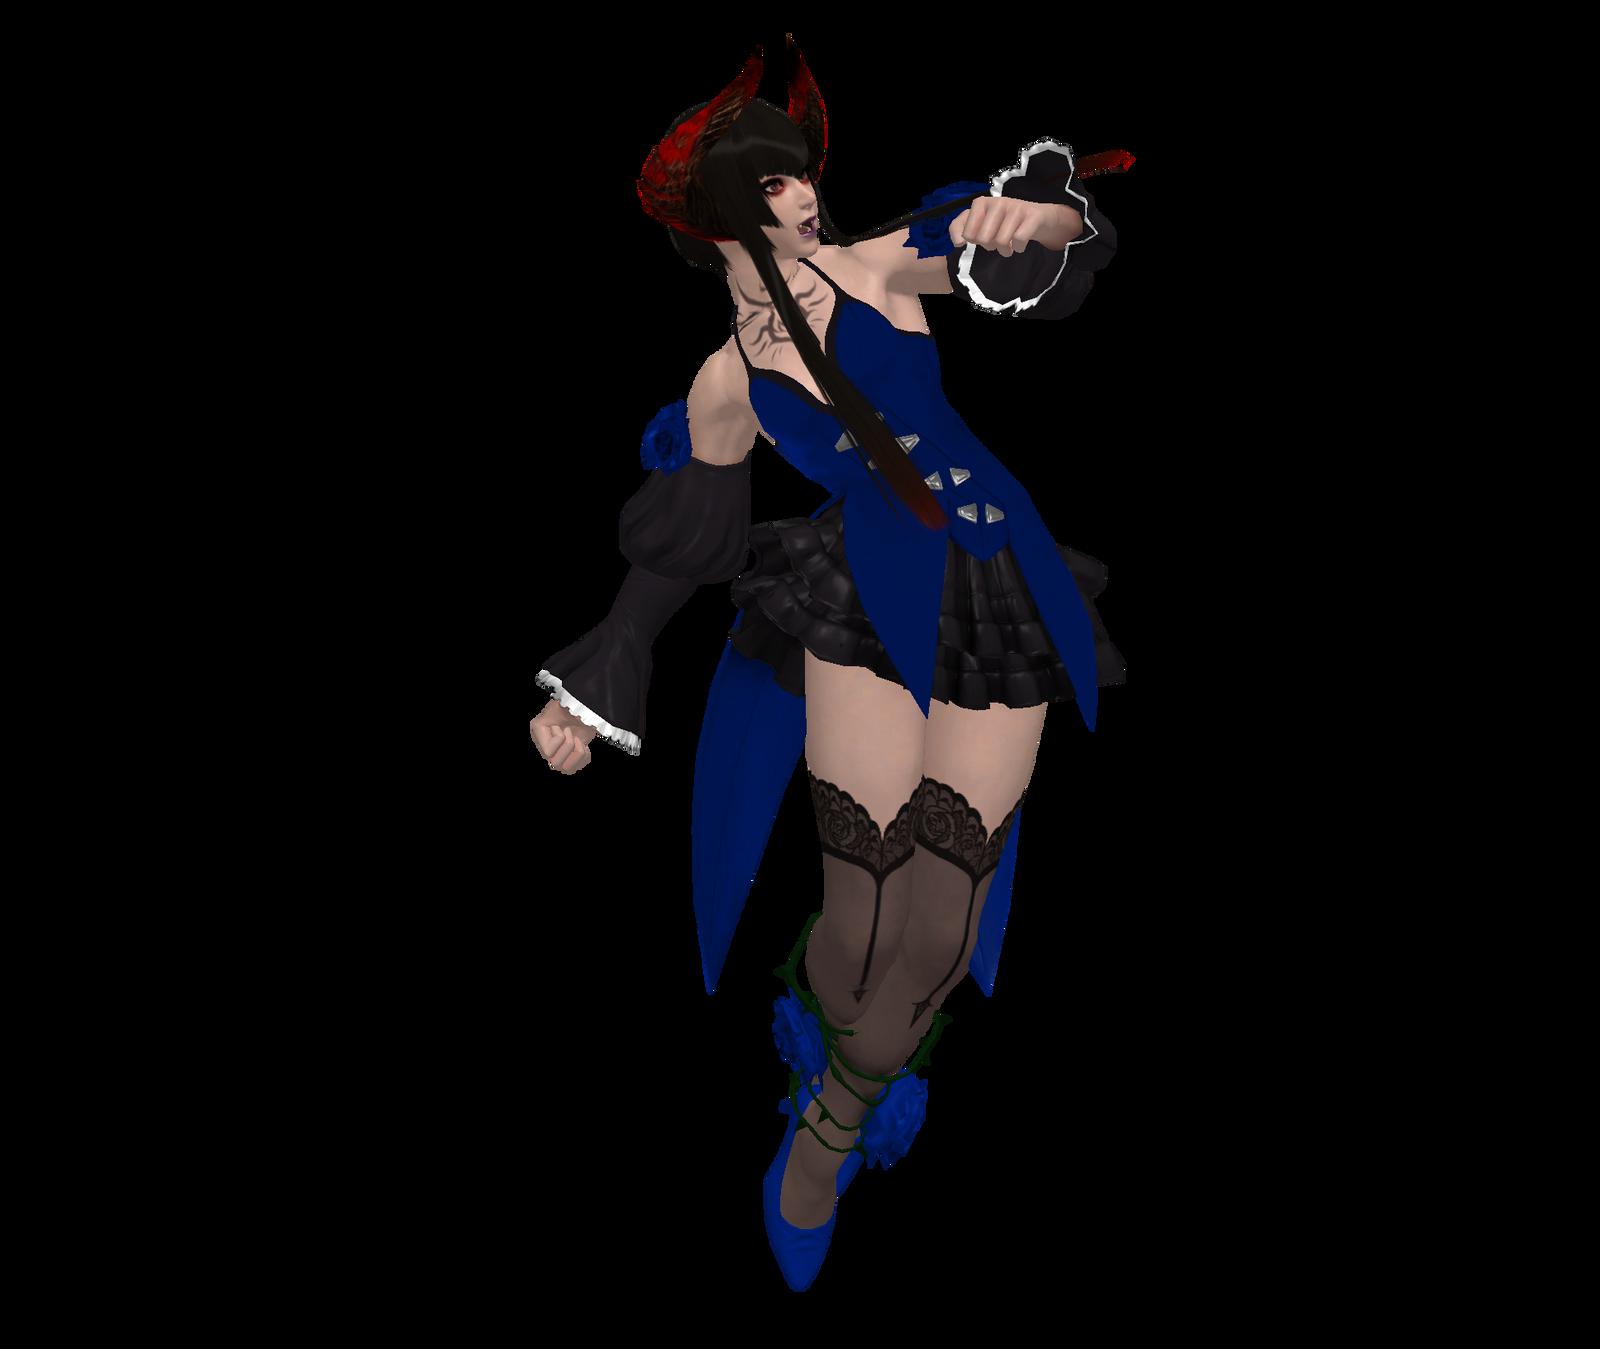 Tekken Revolution - Eliza by eaglespare on DeviantArt